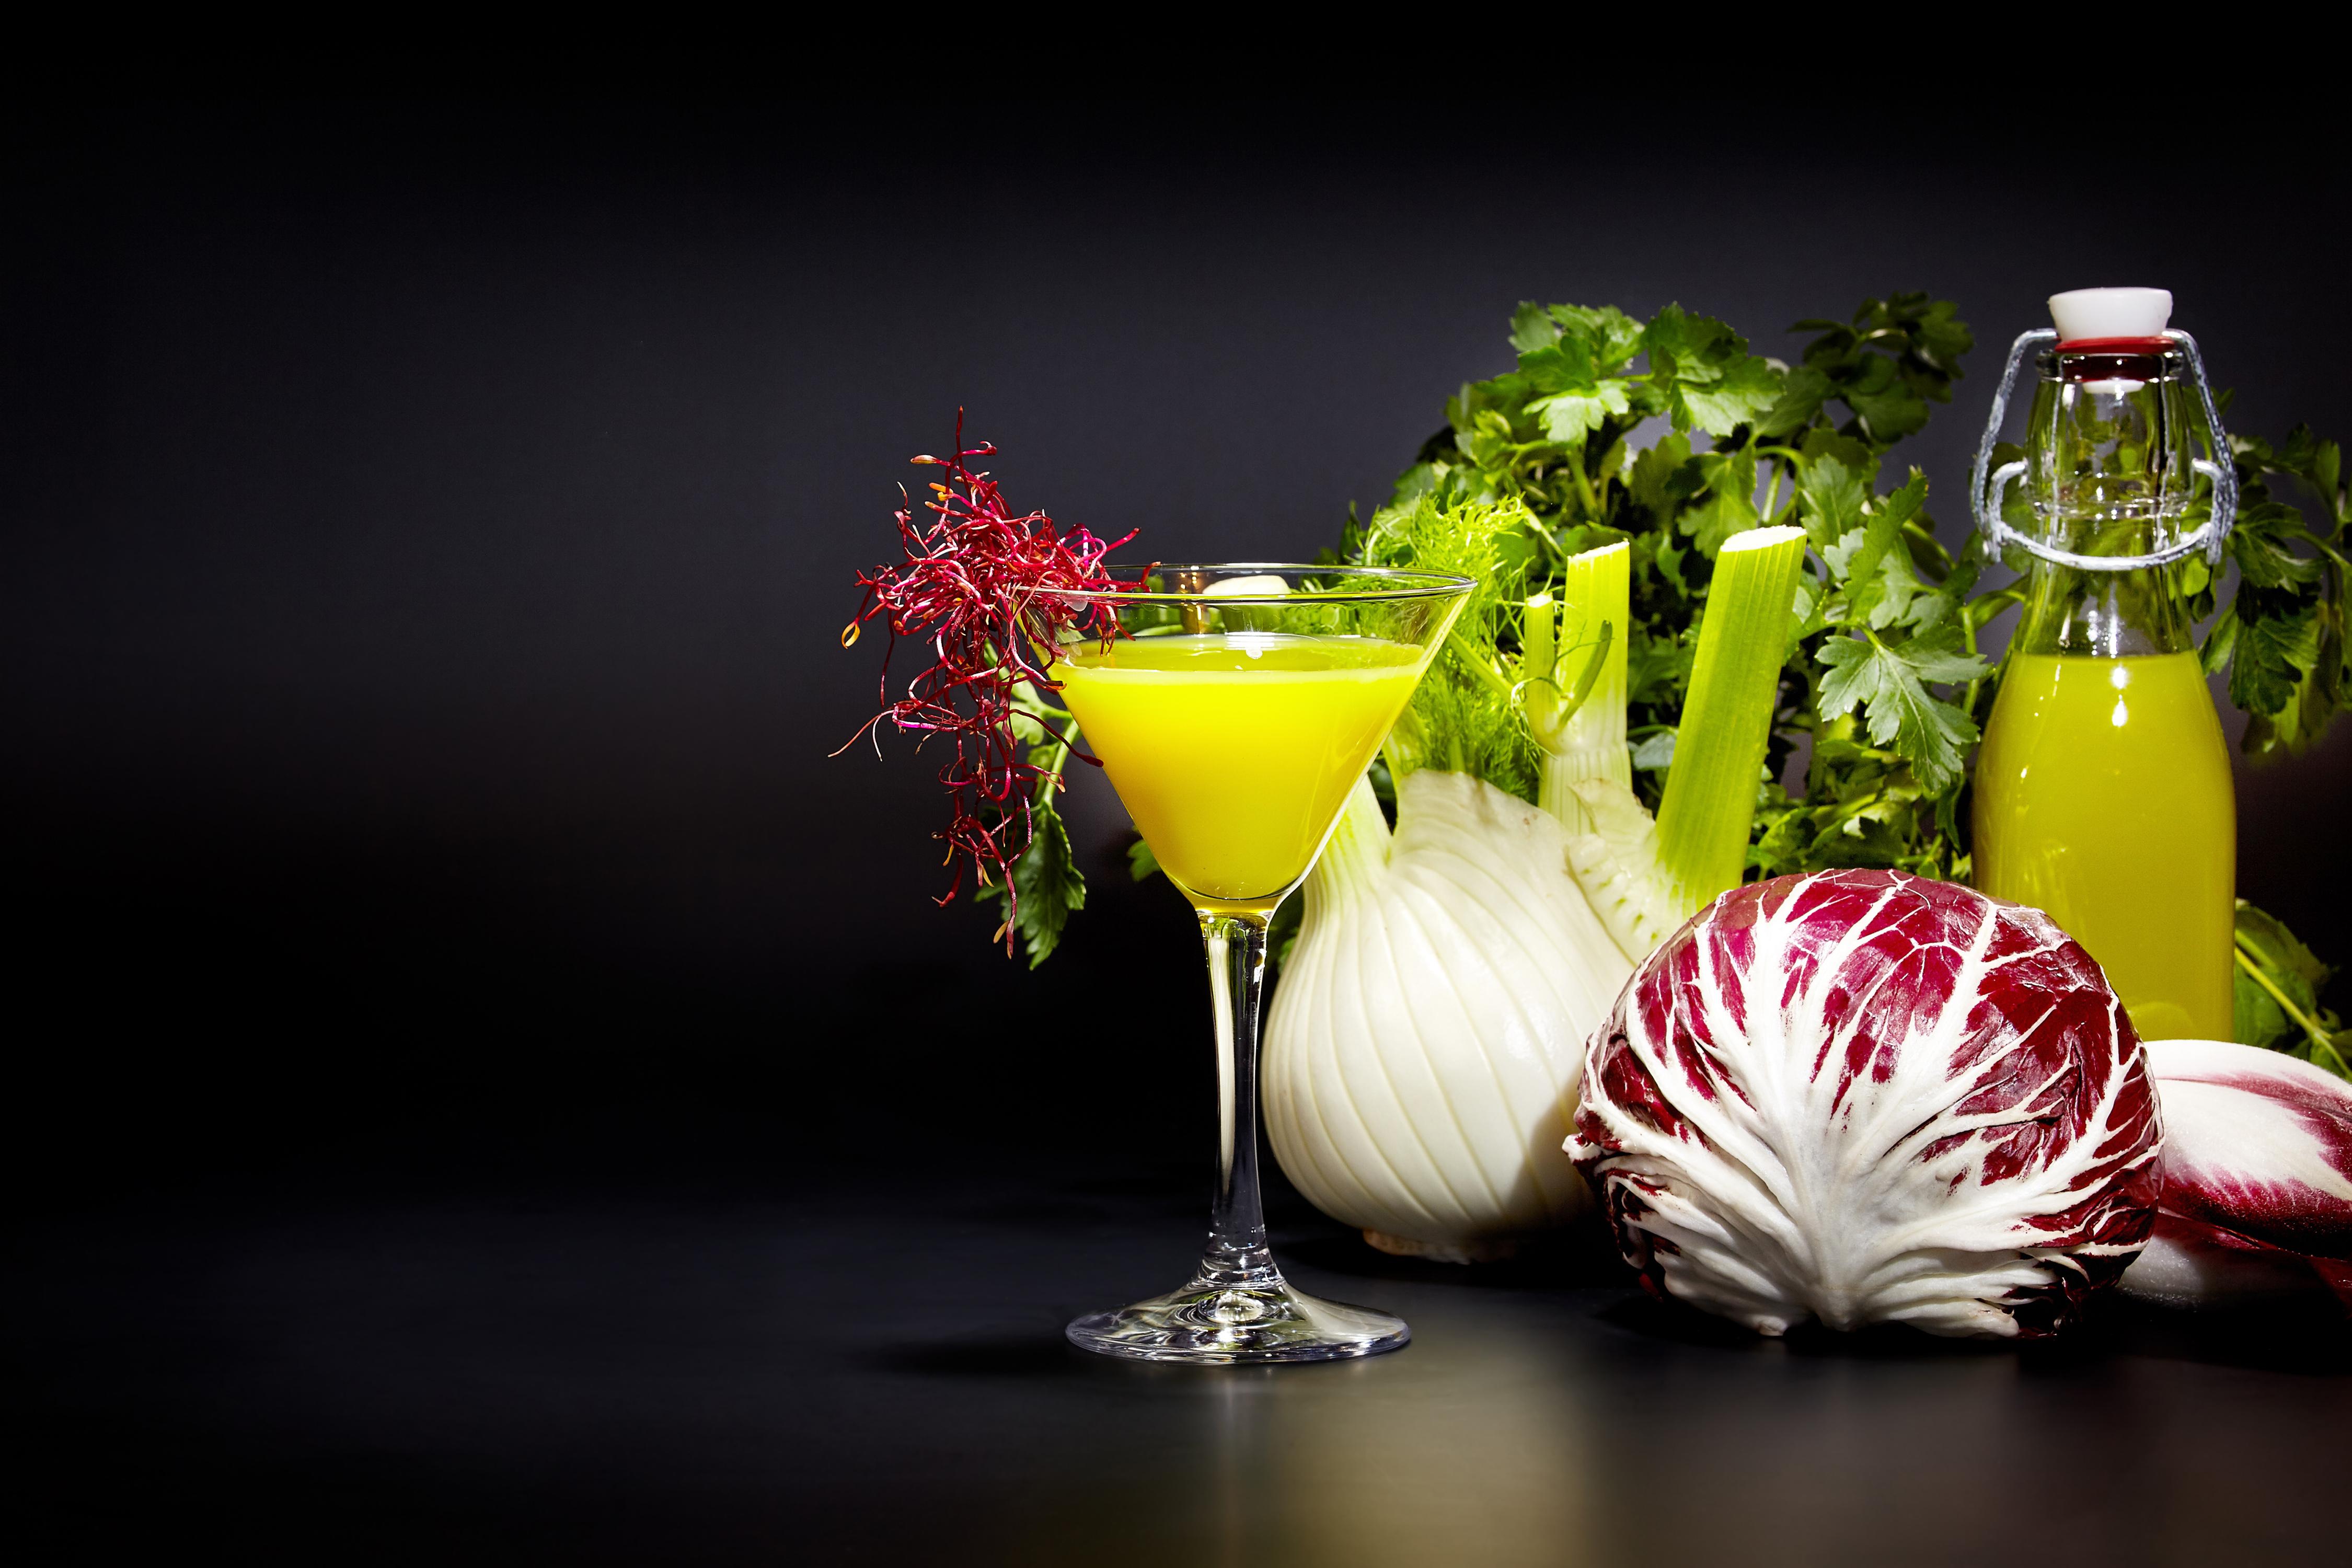 Foto Saft Gemüse flaschen Weinglas Lebensmittel Fruchtsaft Flasche das Essen